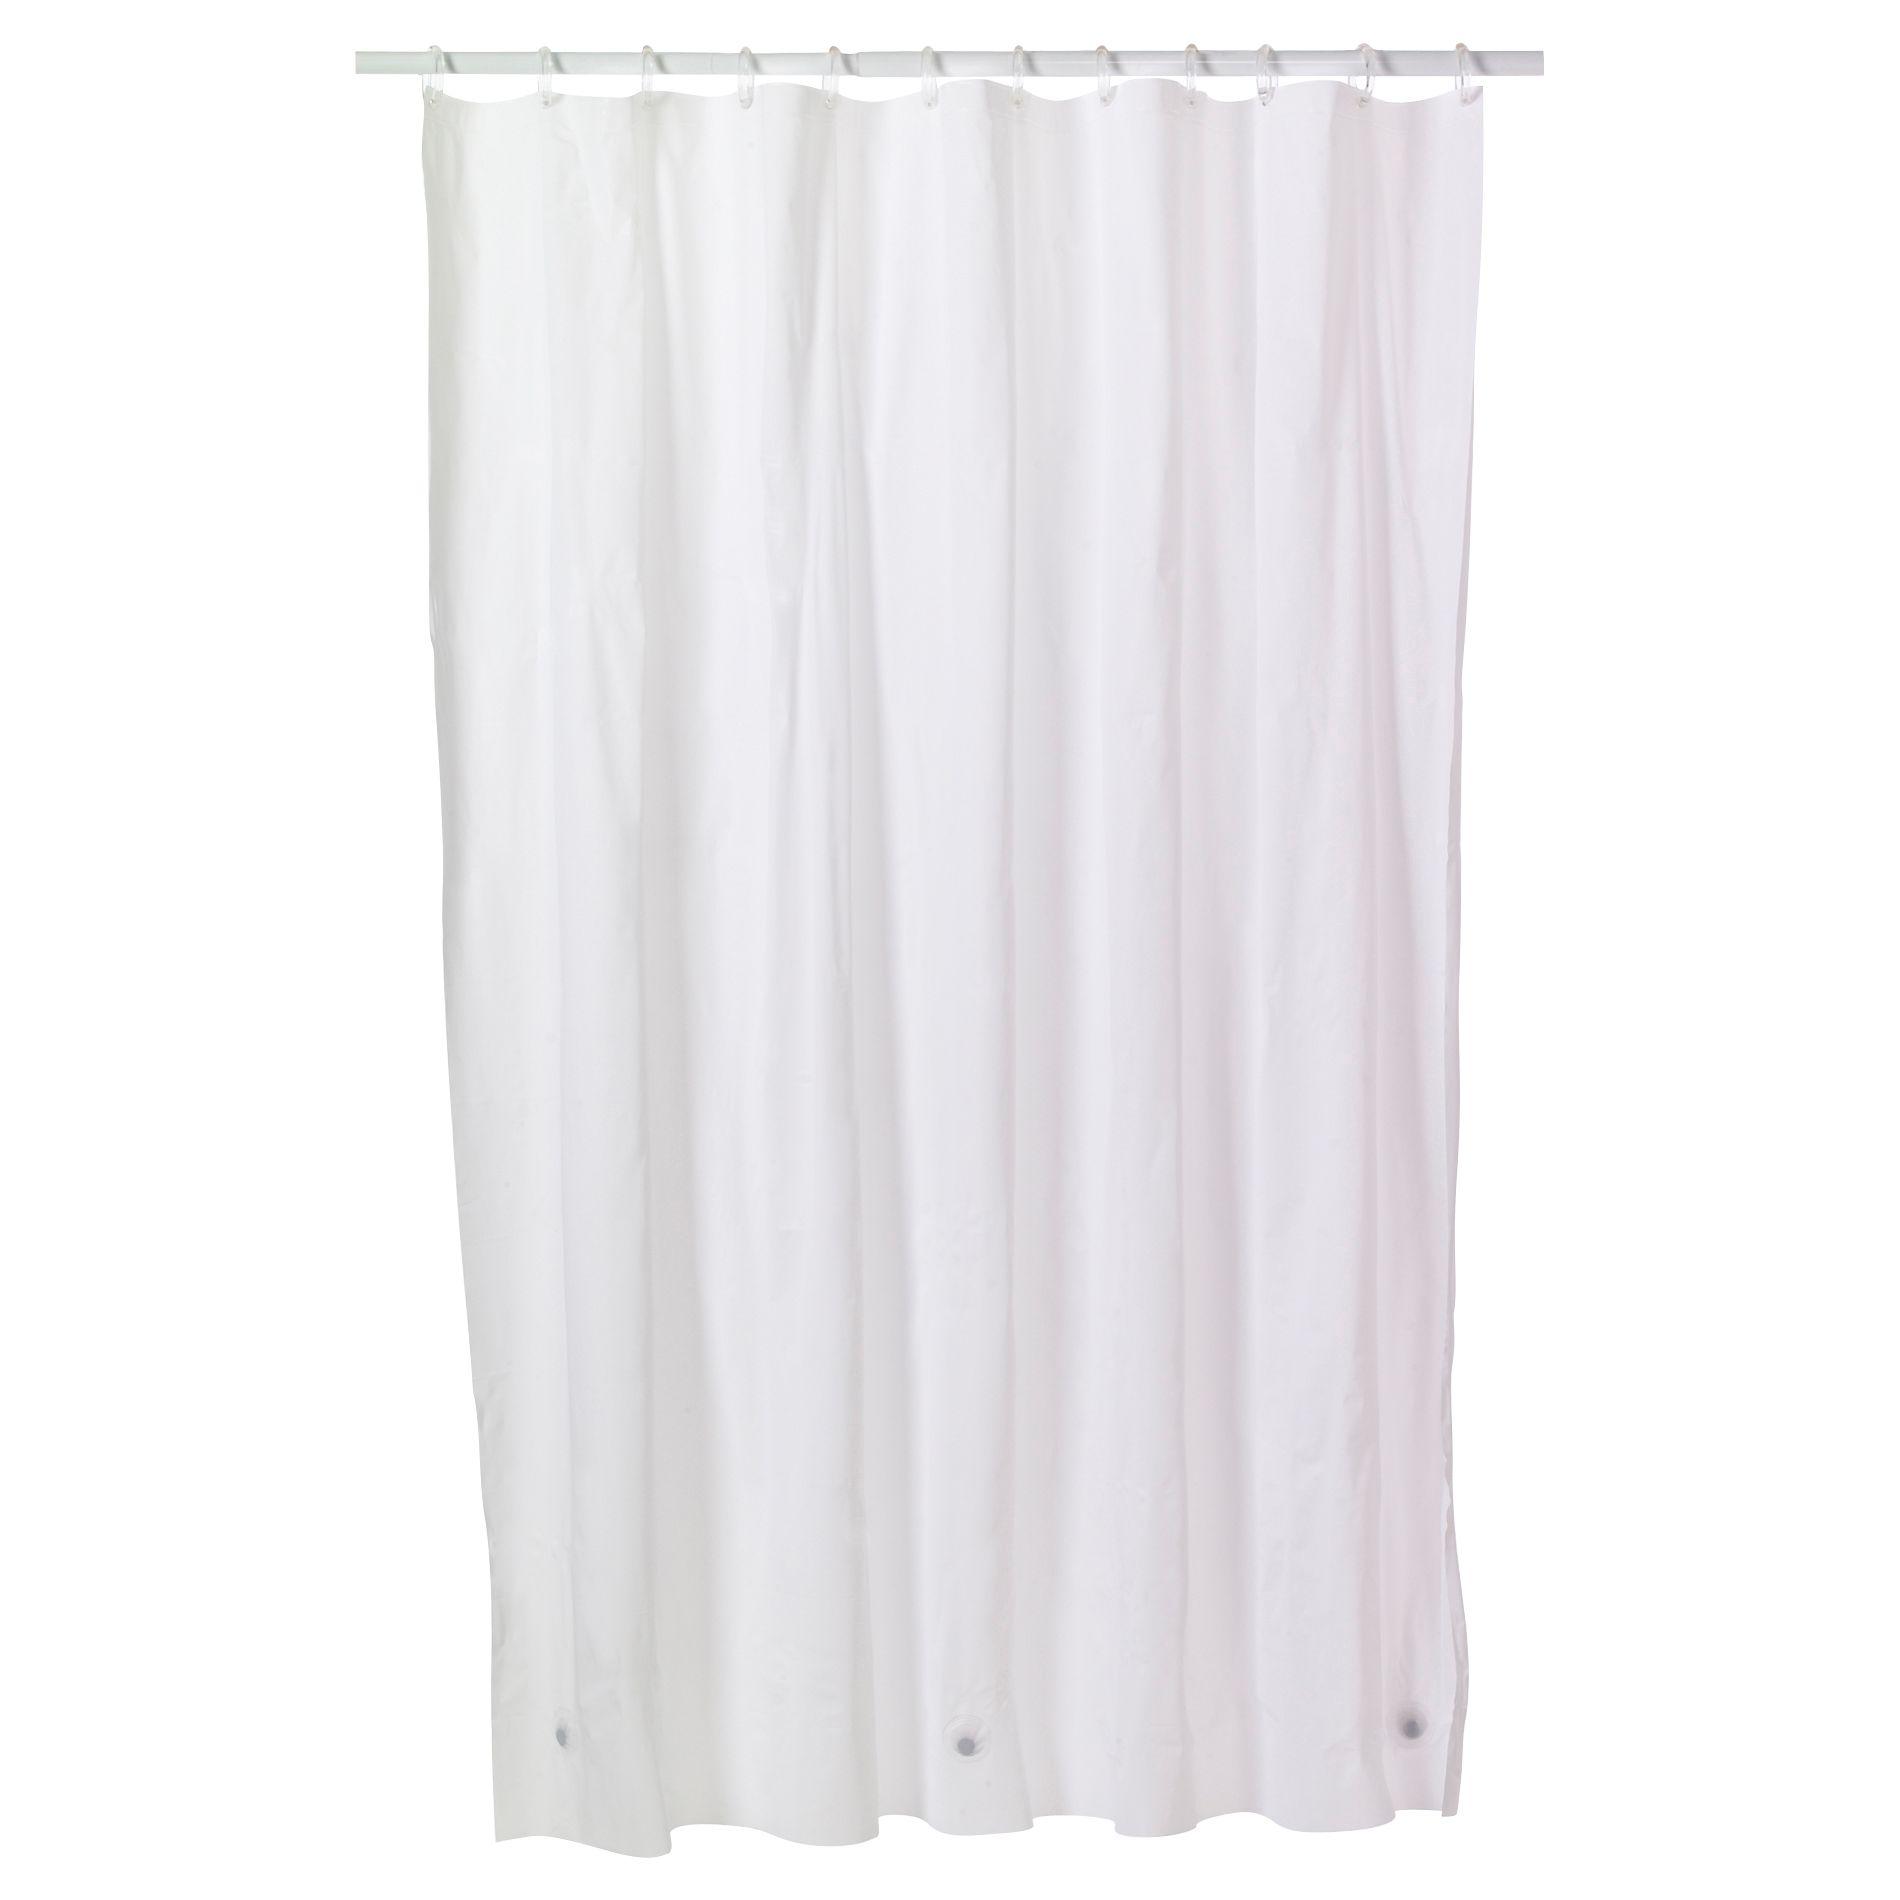 Essential Home Shower Curtain Liner 3 Gauge Vinyl PEVA